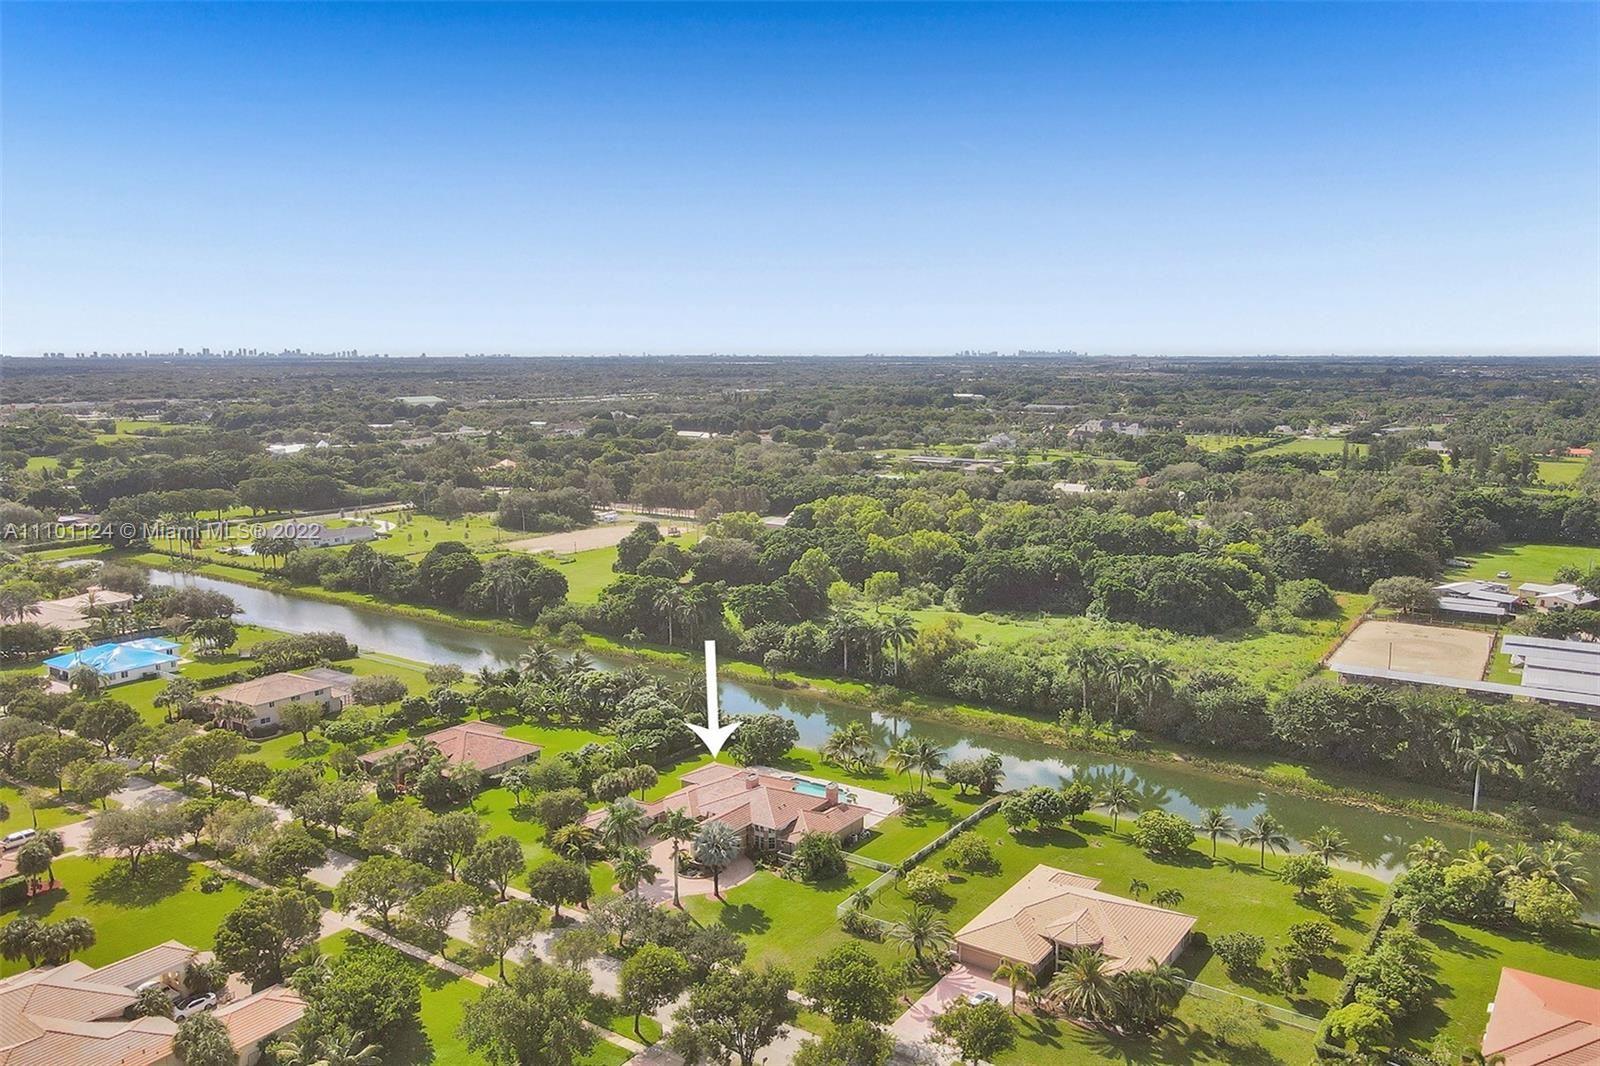 Photo of 13286 Majestic Way, Cooper City, FL 33330 (MLS # A11101124)